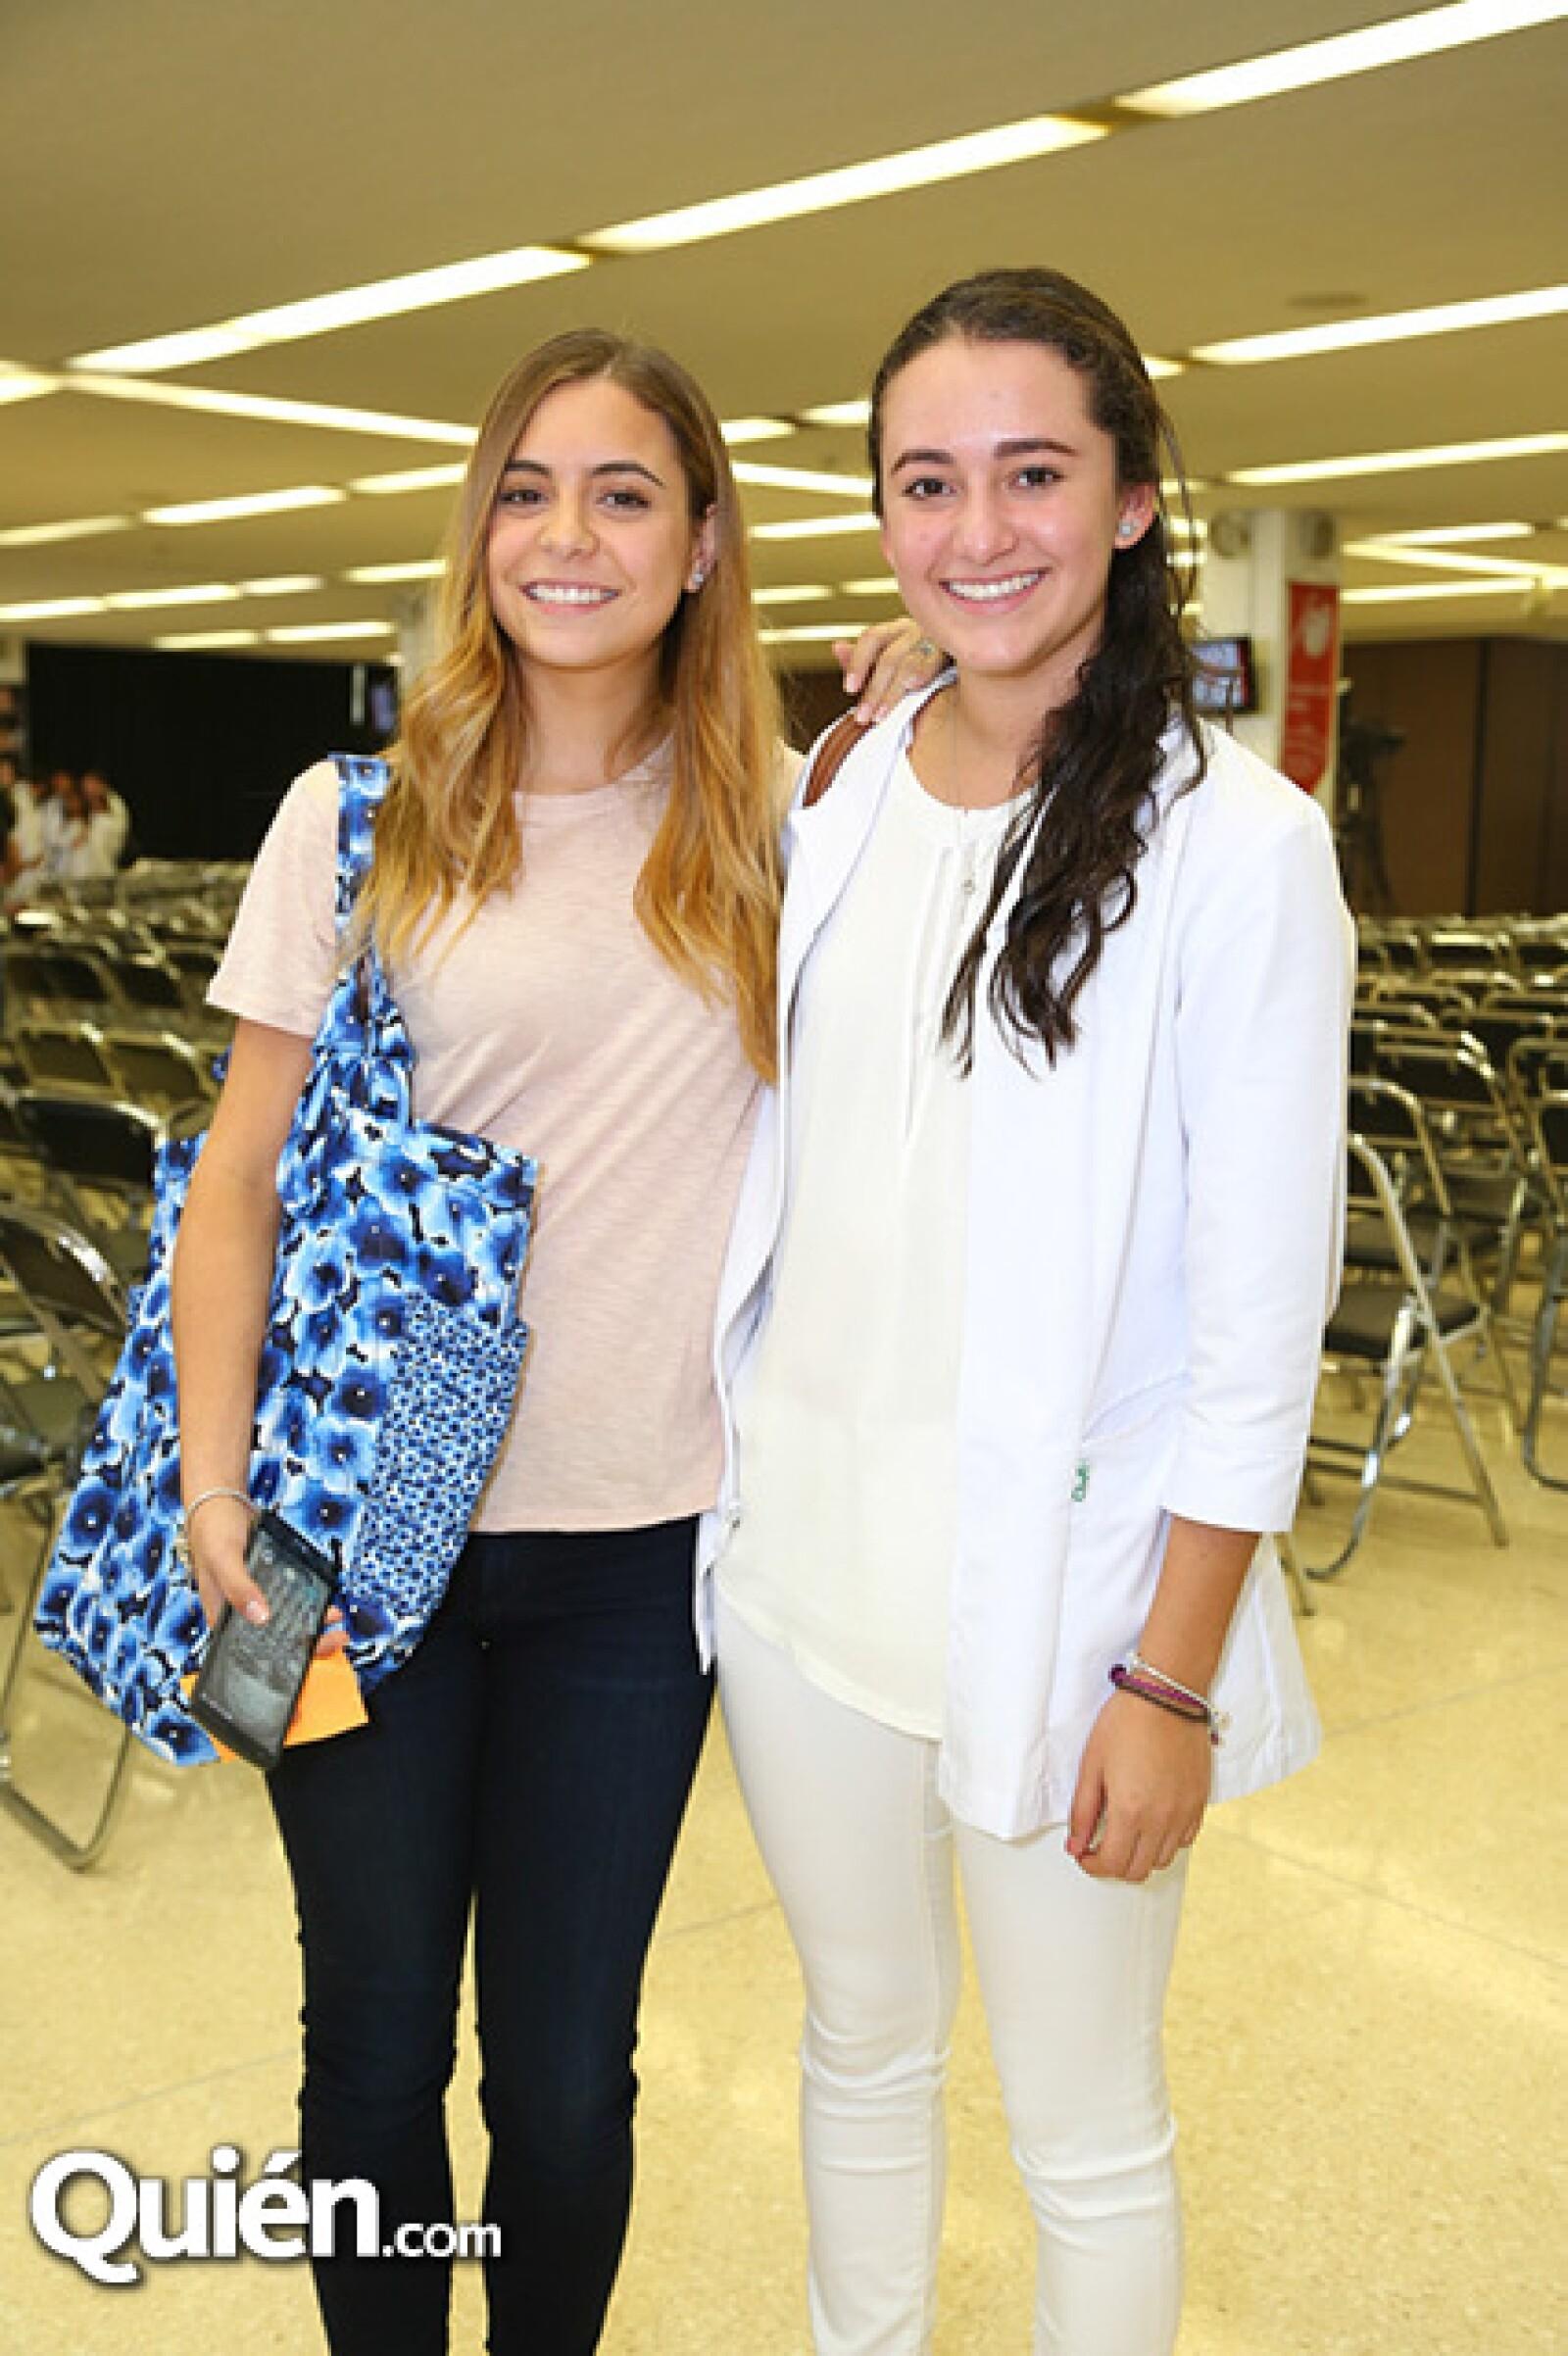 Eugenia Ytuarte y Miranda Urantes